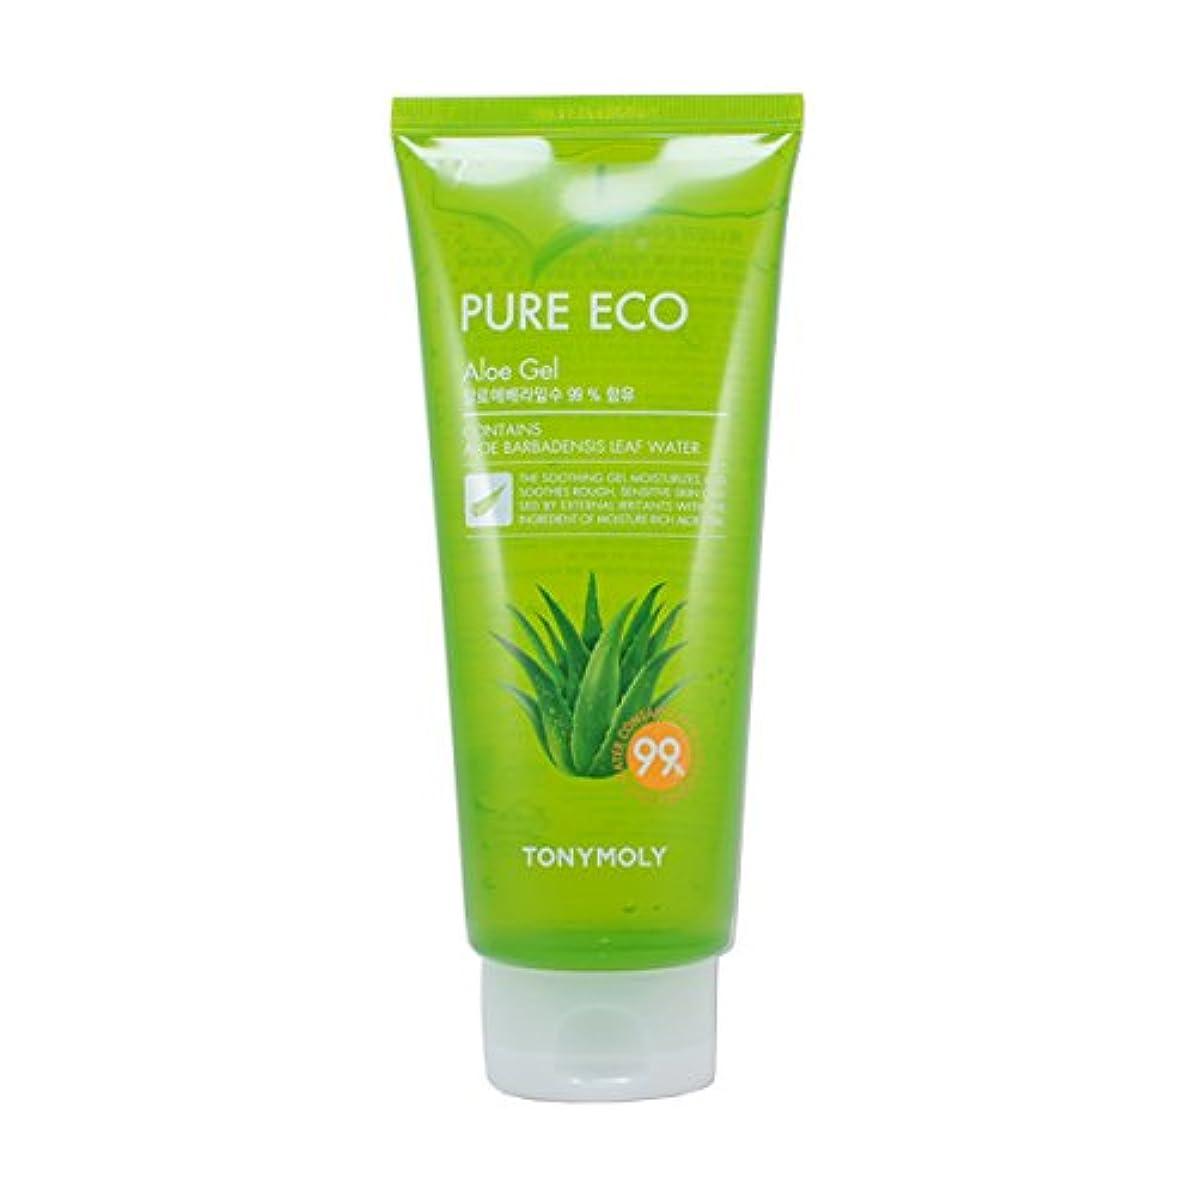 受賞使用法科学的(3 Pack) TONYMOLY Pure Eco Aloe Gel (Tube) (並行輸入品)